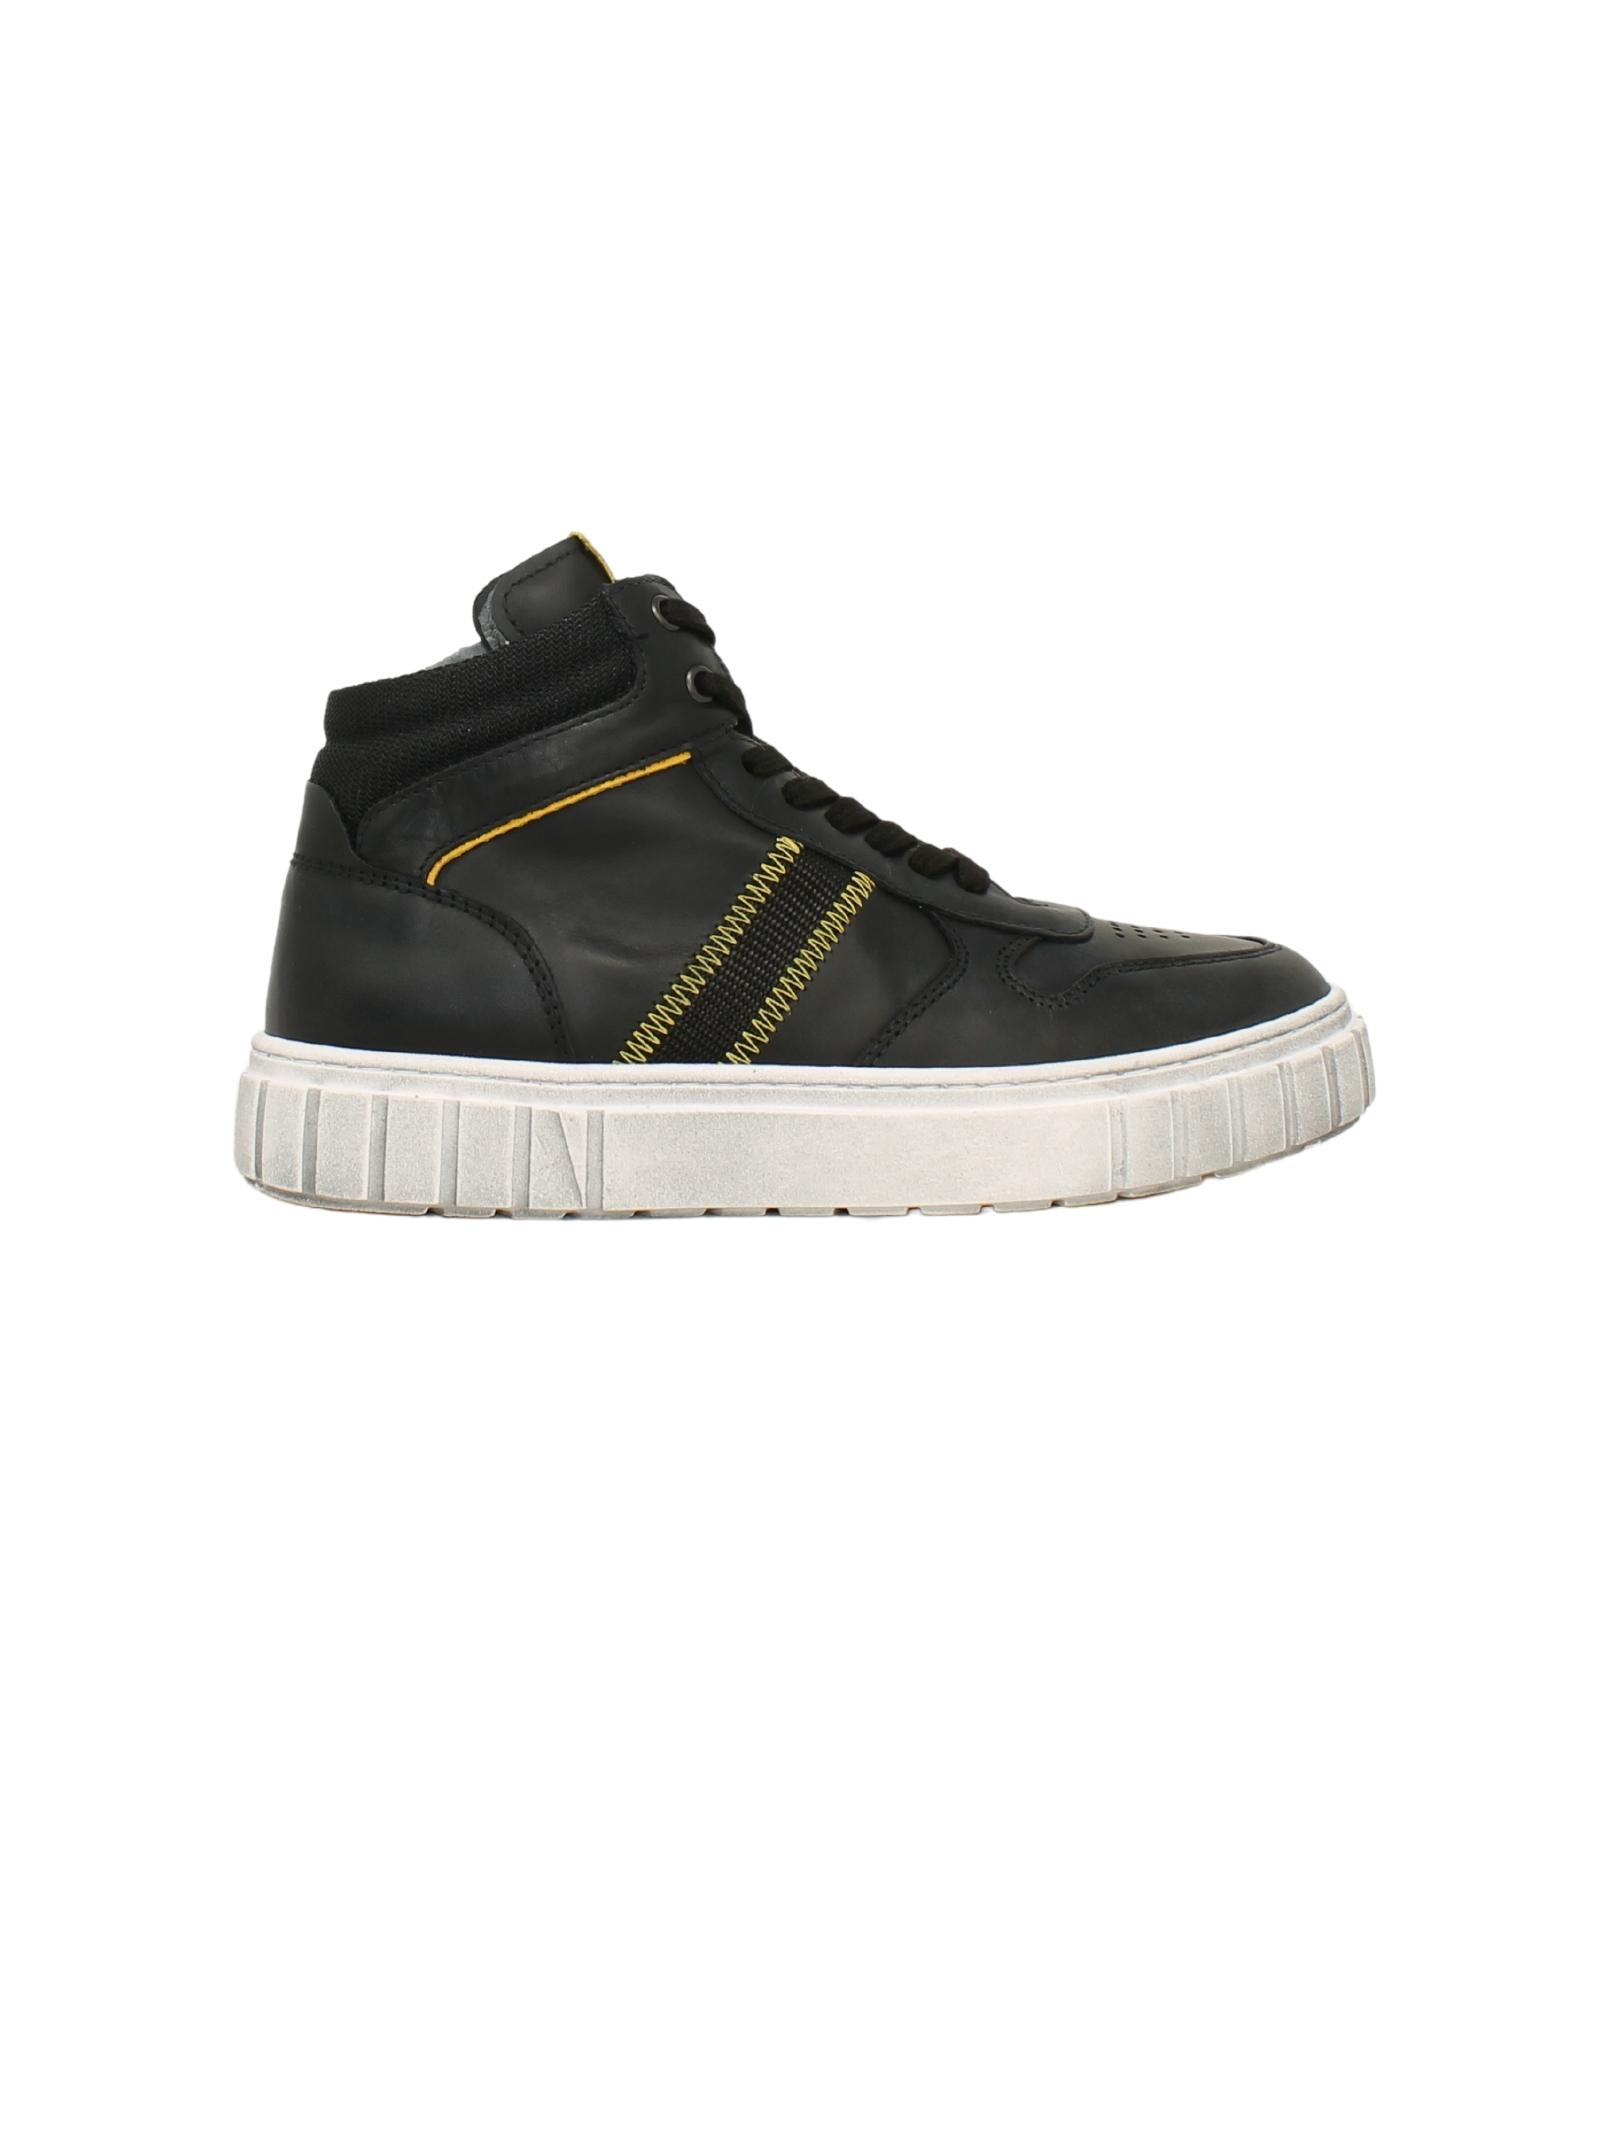 Sneakers Black Yellow Bambino NERO GIARDINI JUNIOR   Sneakers   134150M100